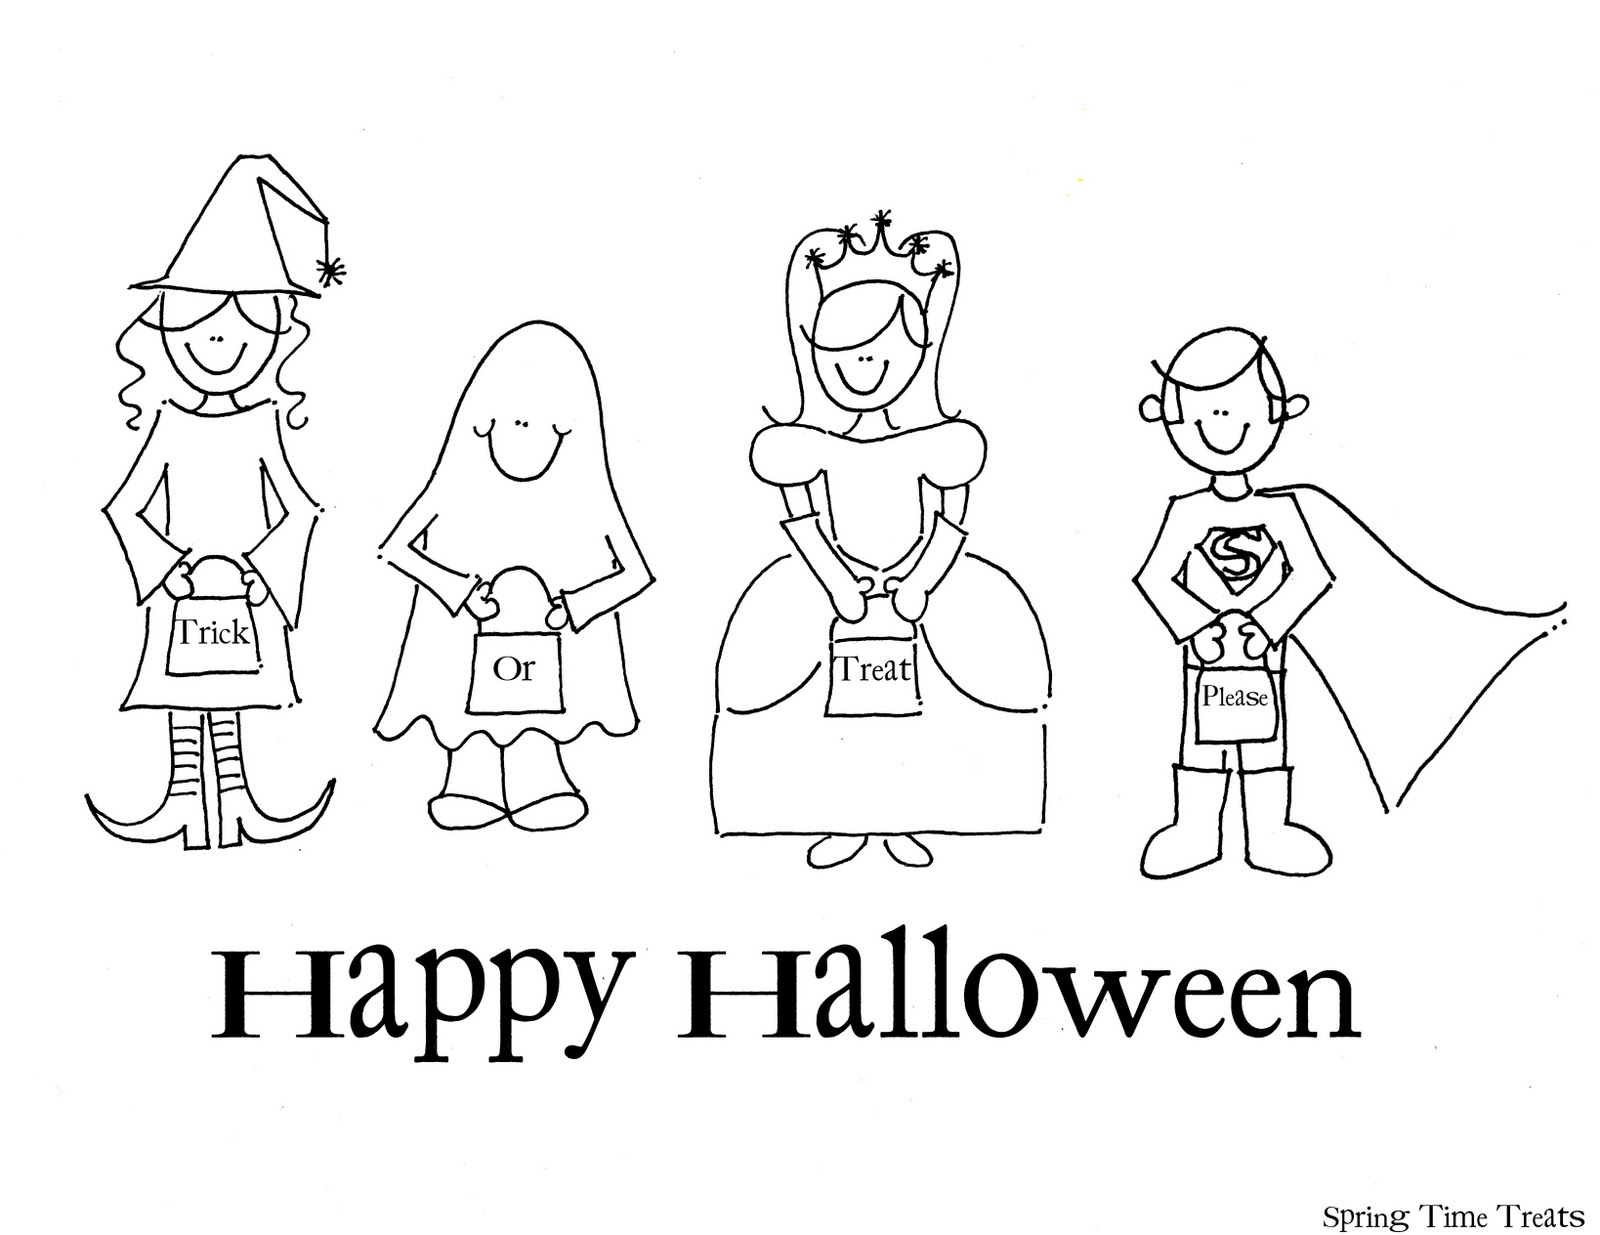 1600x1235 Spring Time Treats Happy Halloween Printable